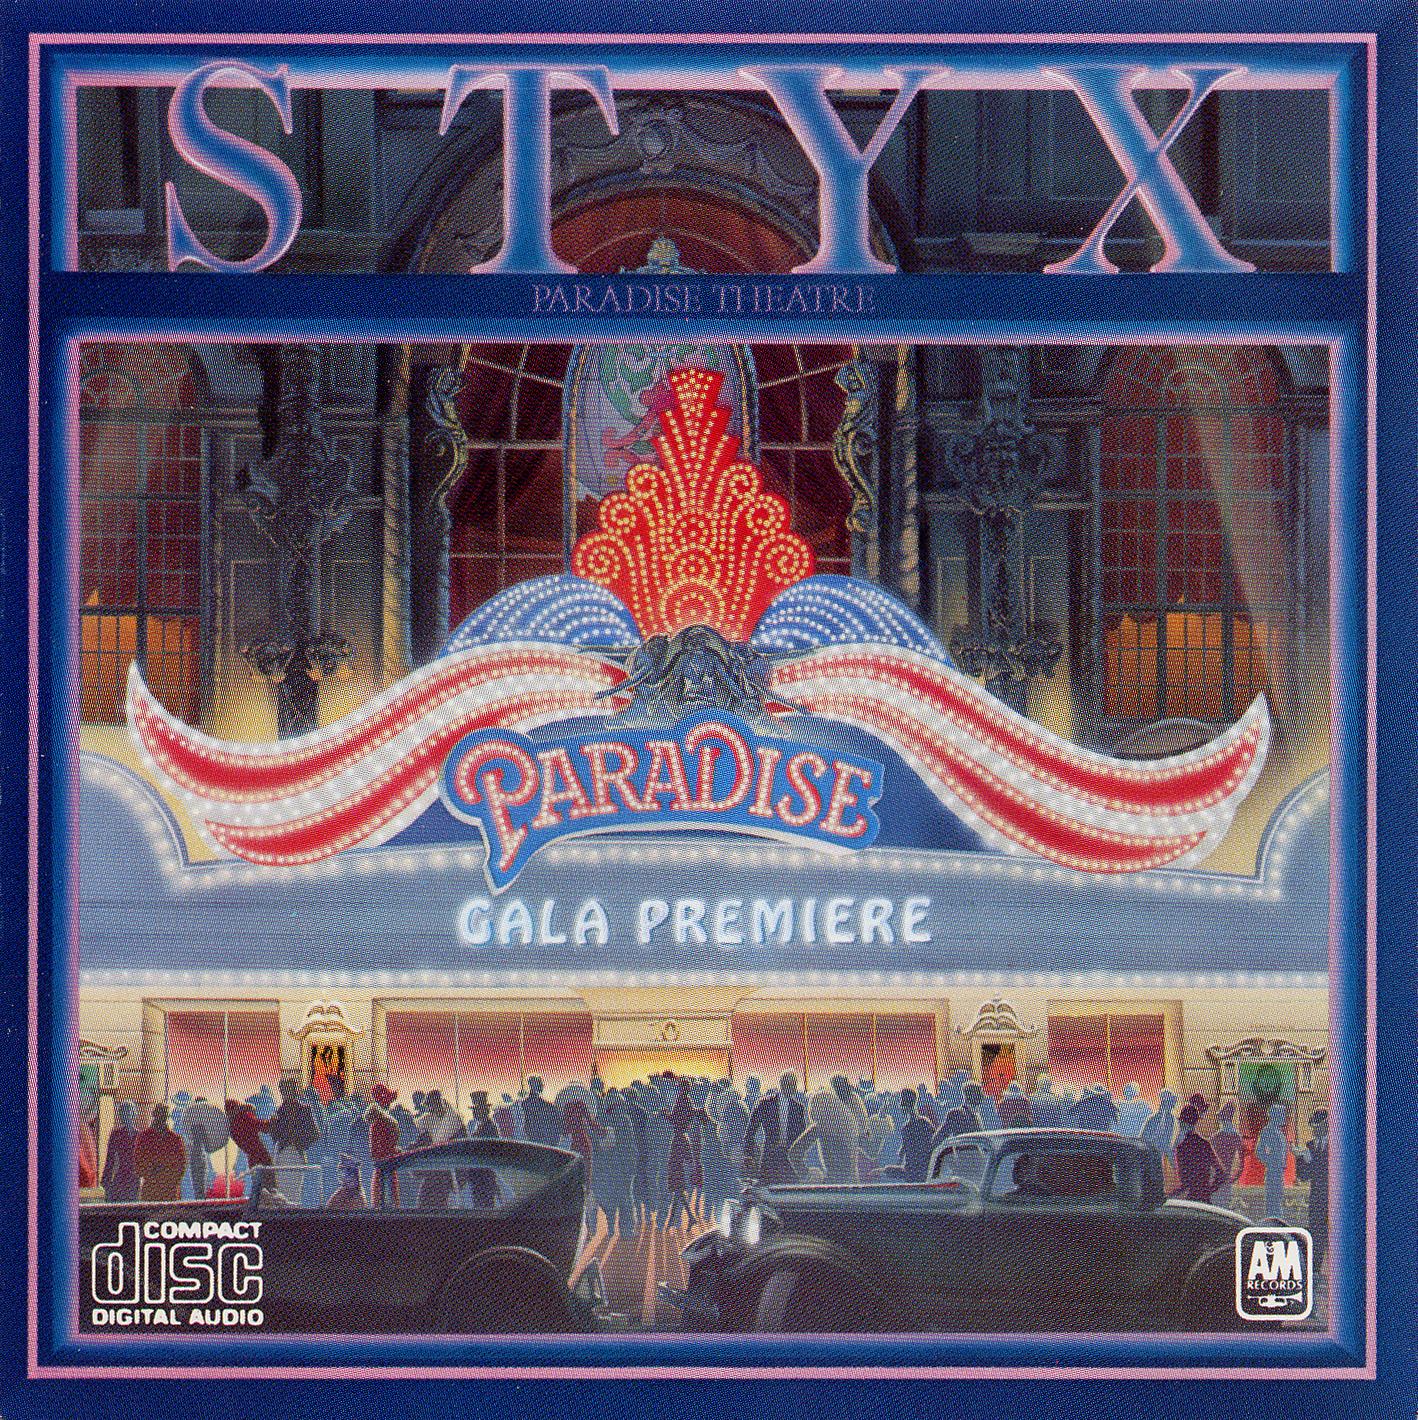 styx_paradise_theatre_1981.jpg